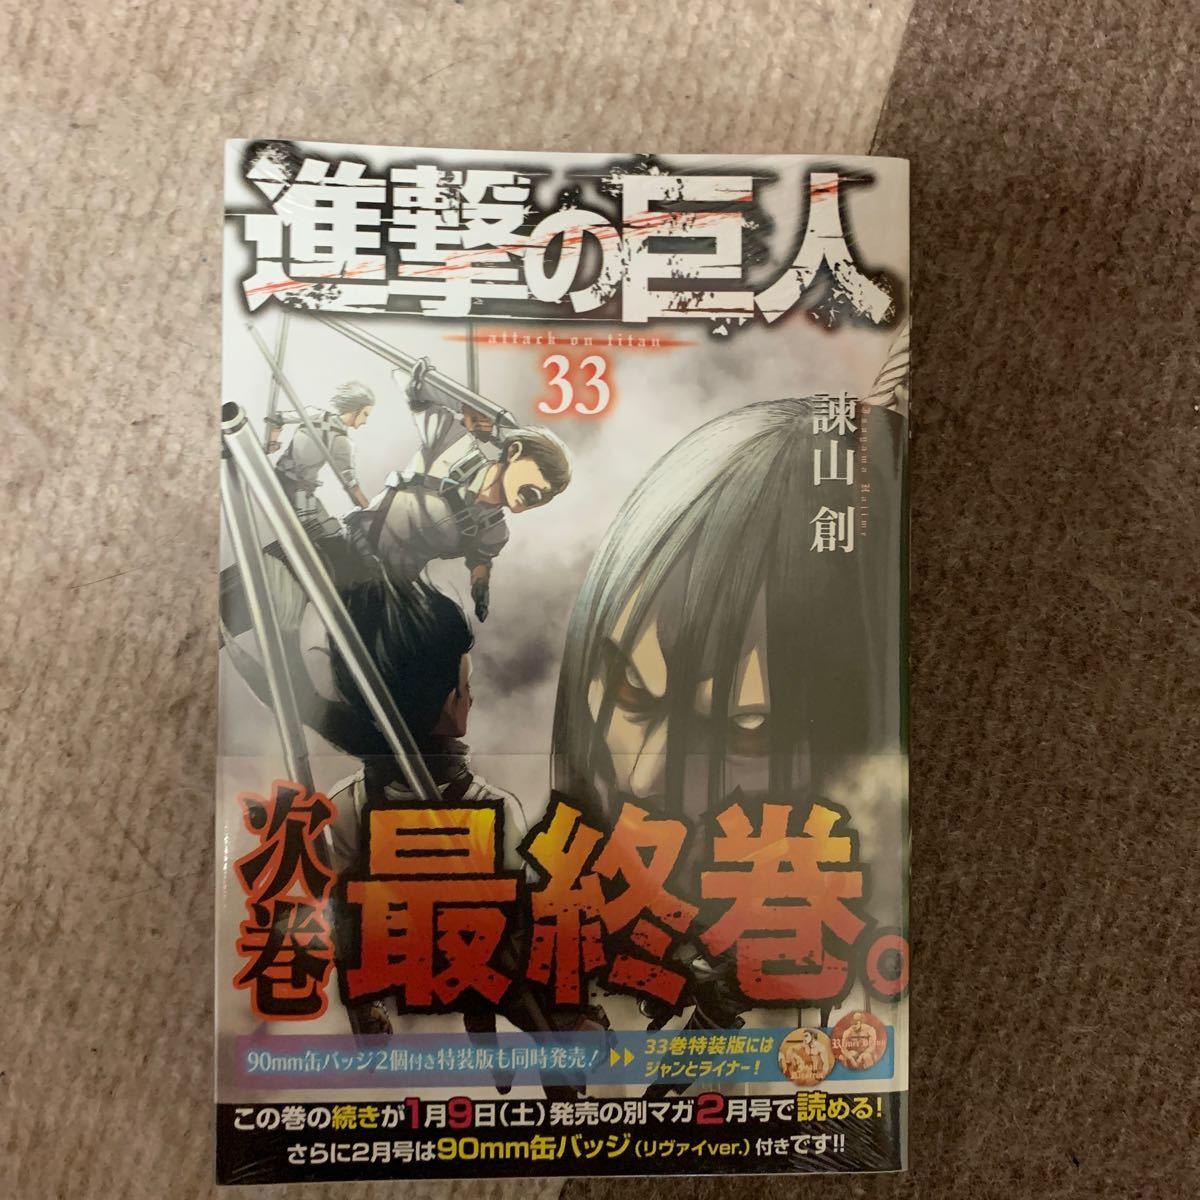 進撃の巨人 講談社 諌山創 1-33巻セット